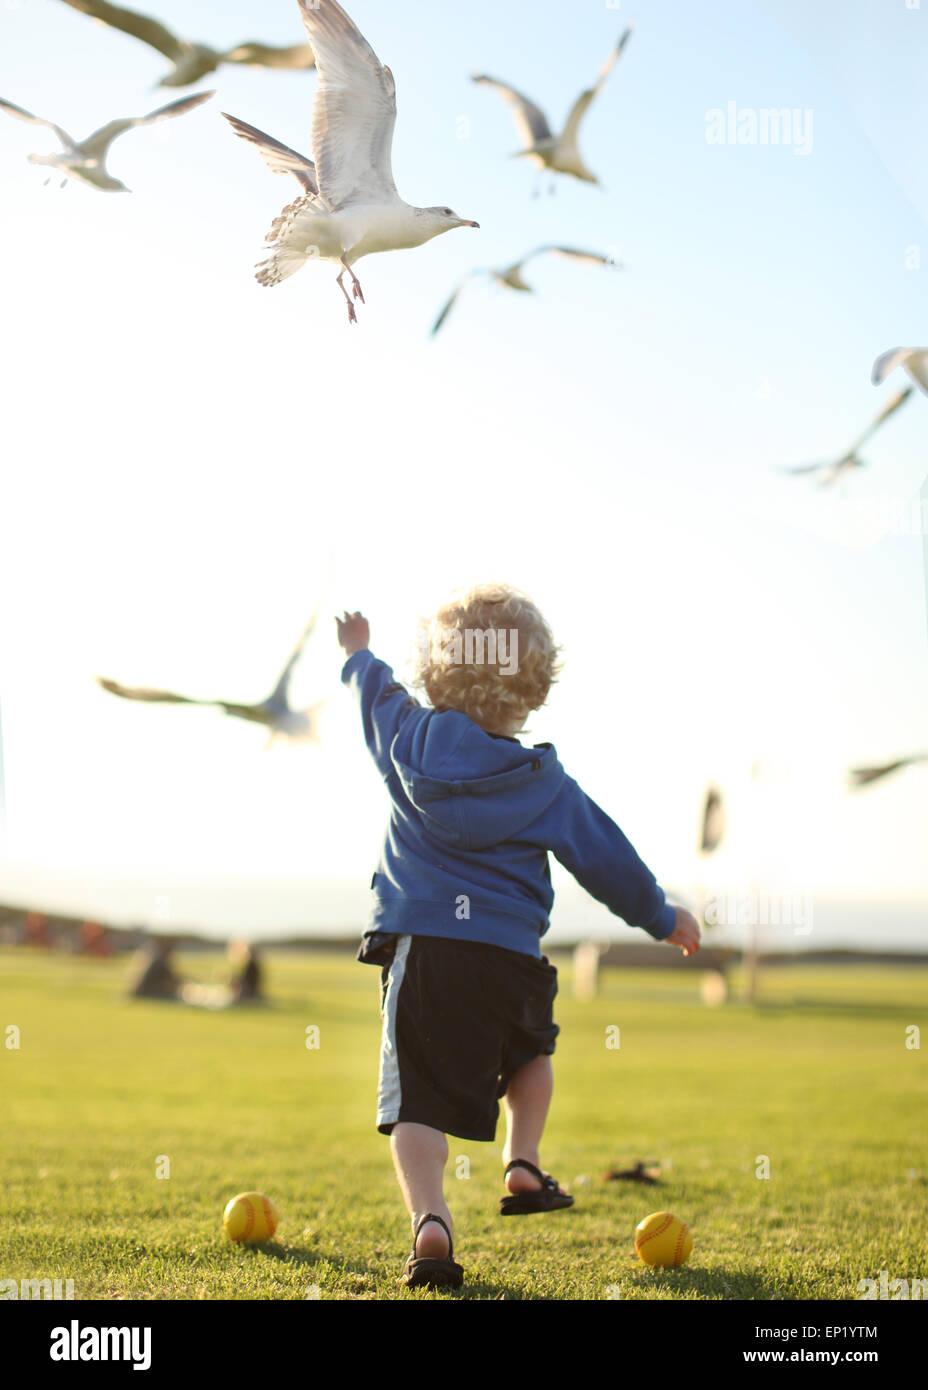 Boy chasing seagulls - Stock Image